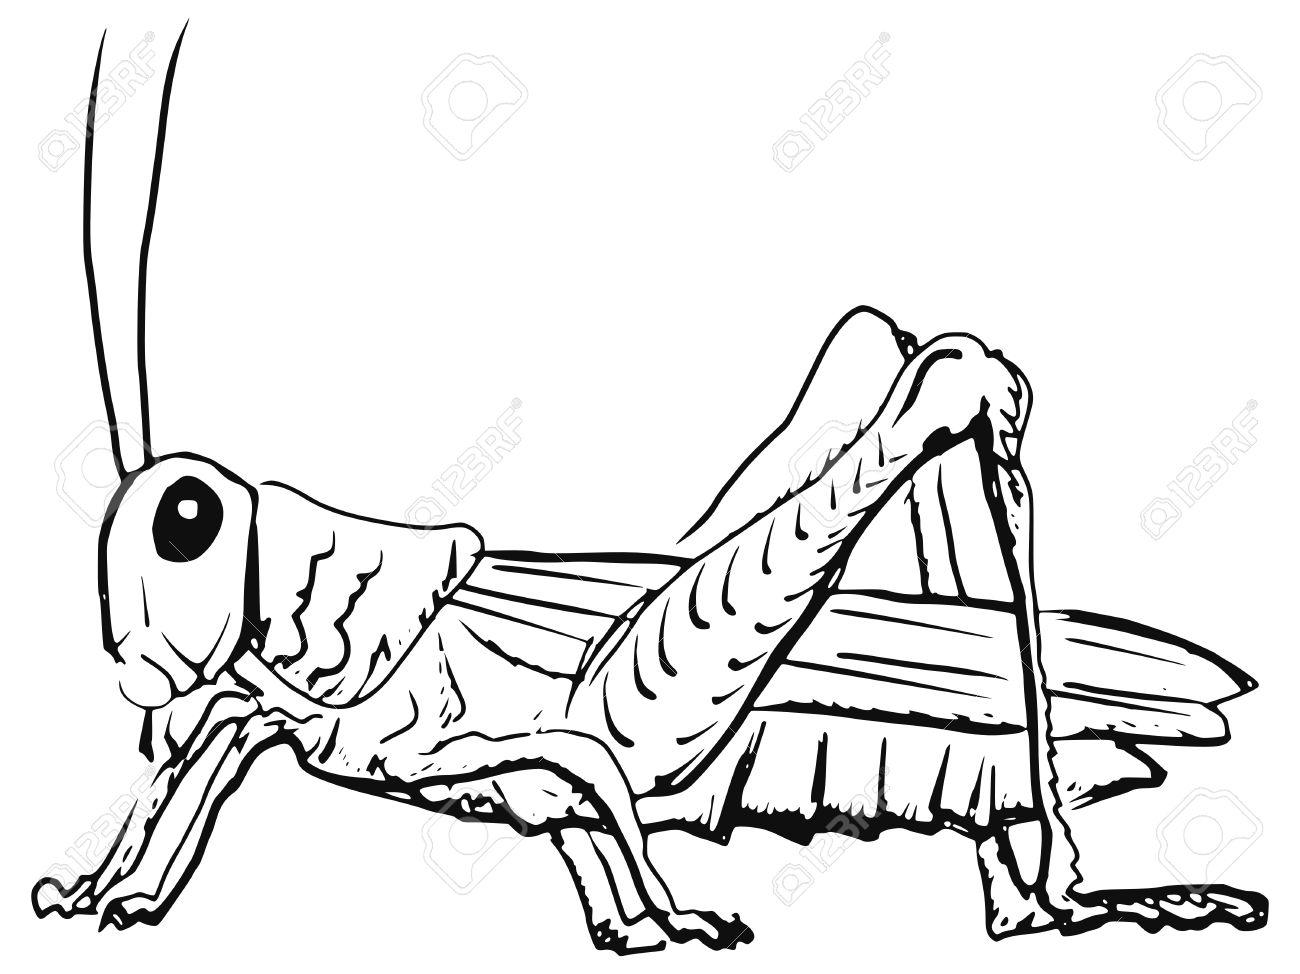 grasshopper clipart black and white. cartoon hand drawn illustration of grasshopper stock vector 28795562 clipart black and white